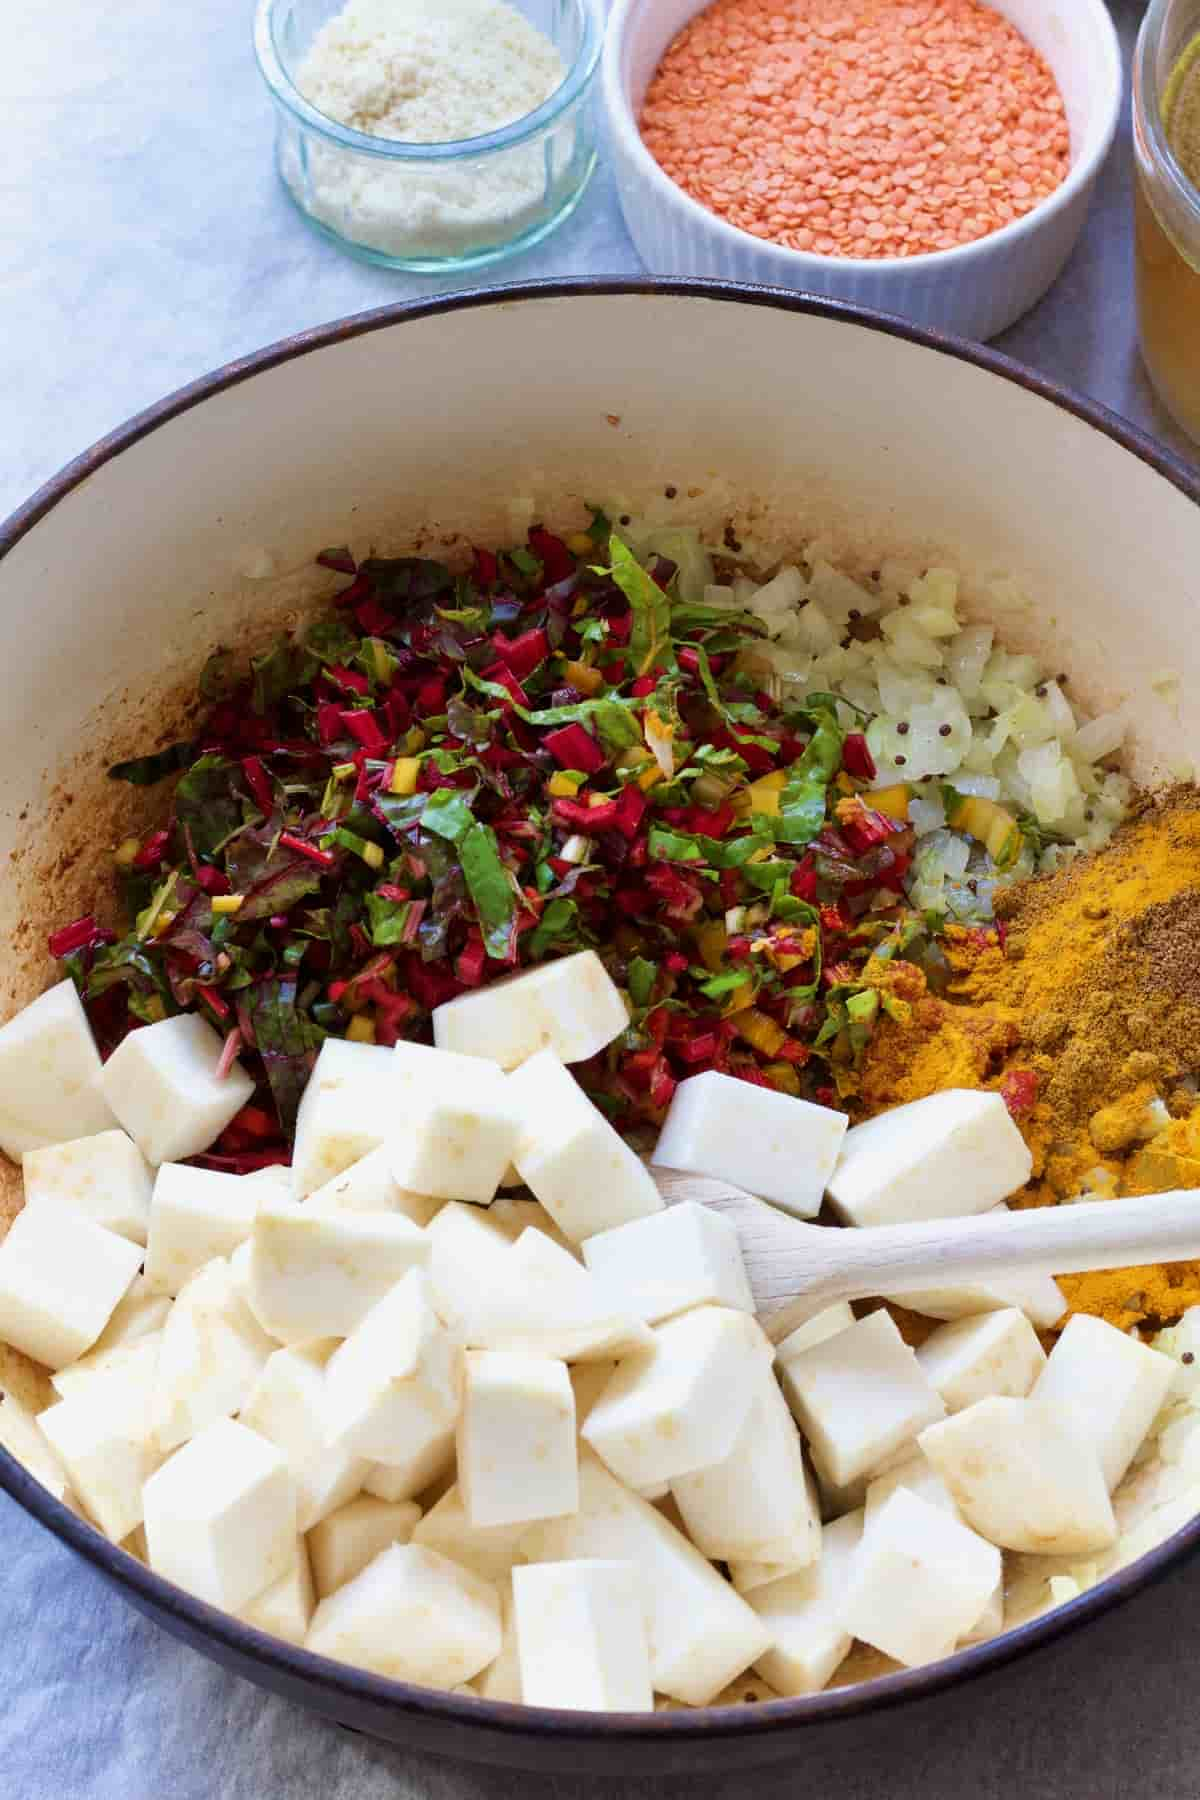 Pot with celeriac cubes, chard stalks, onion & spices.